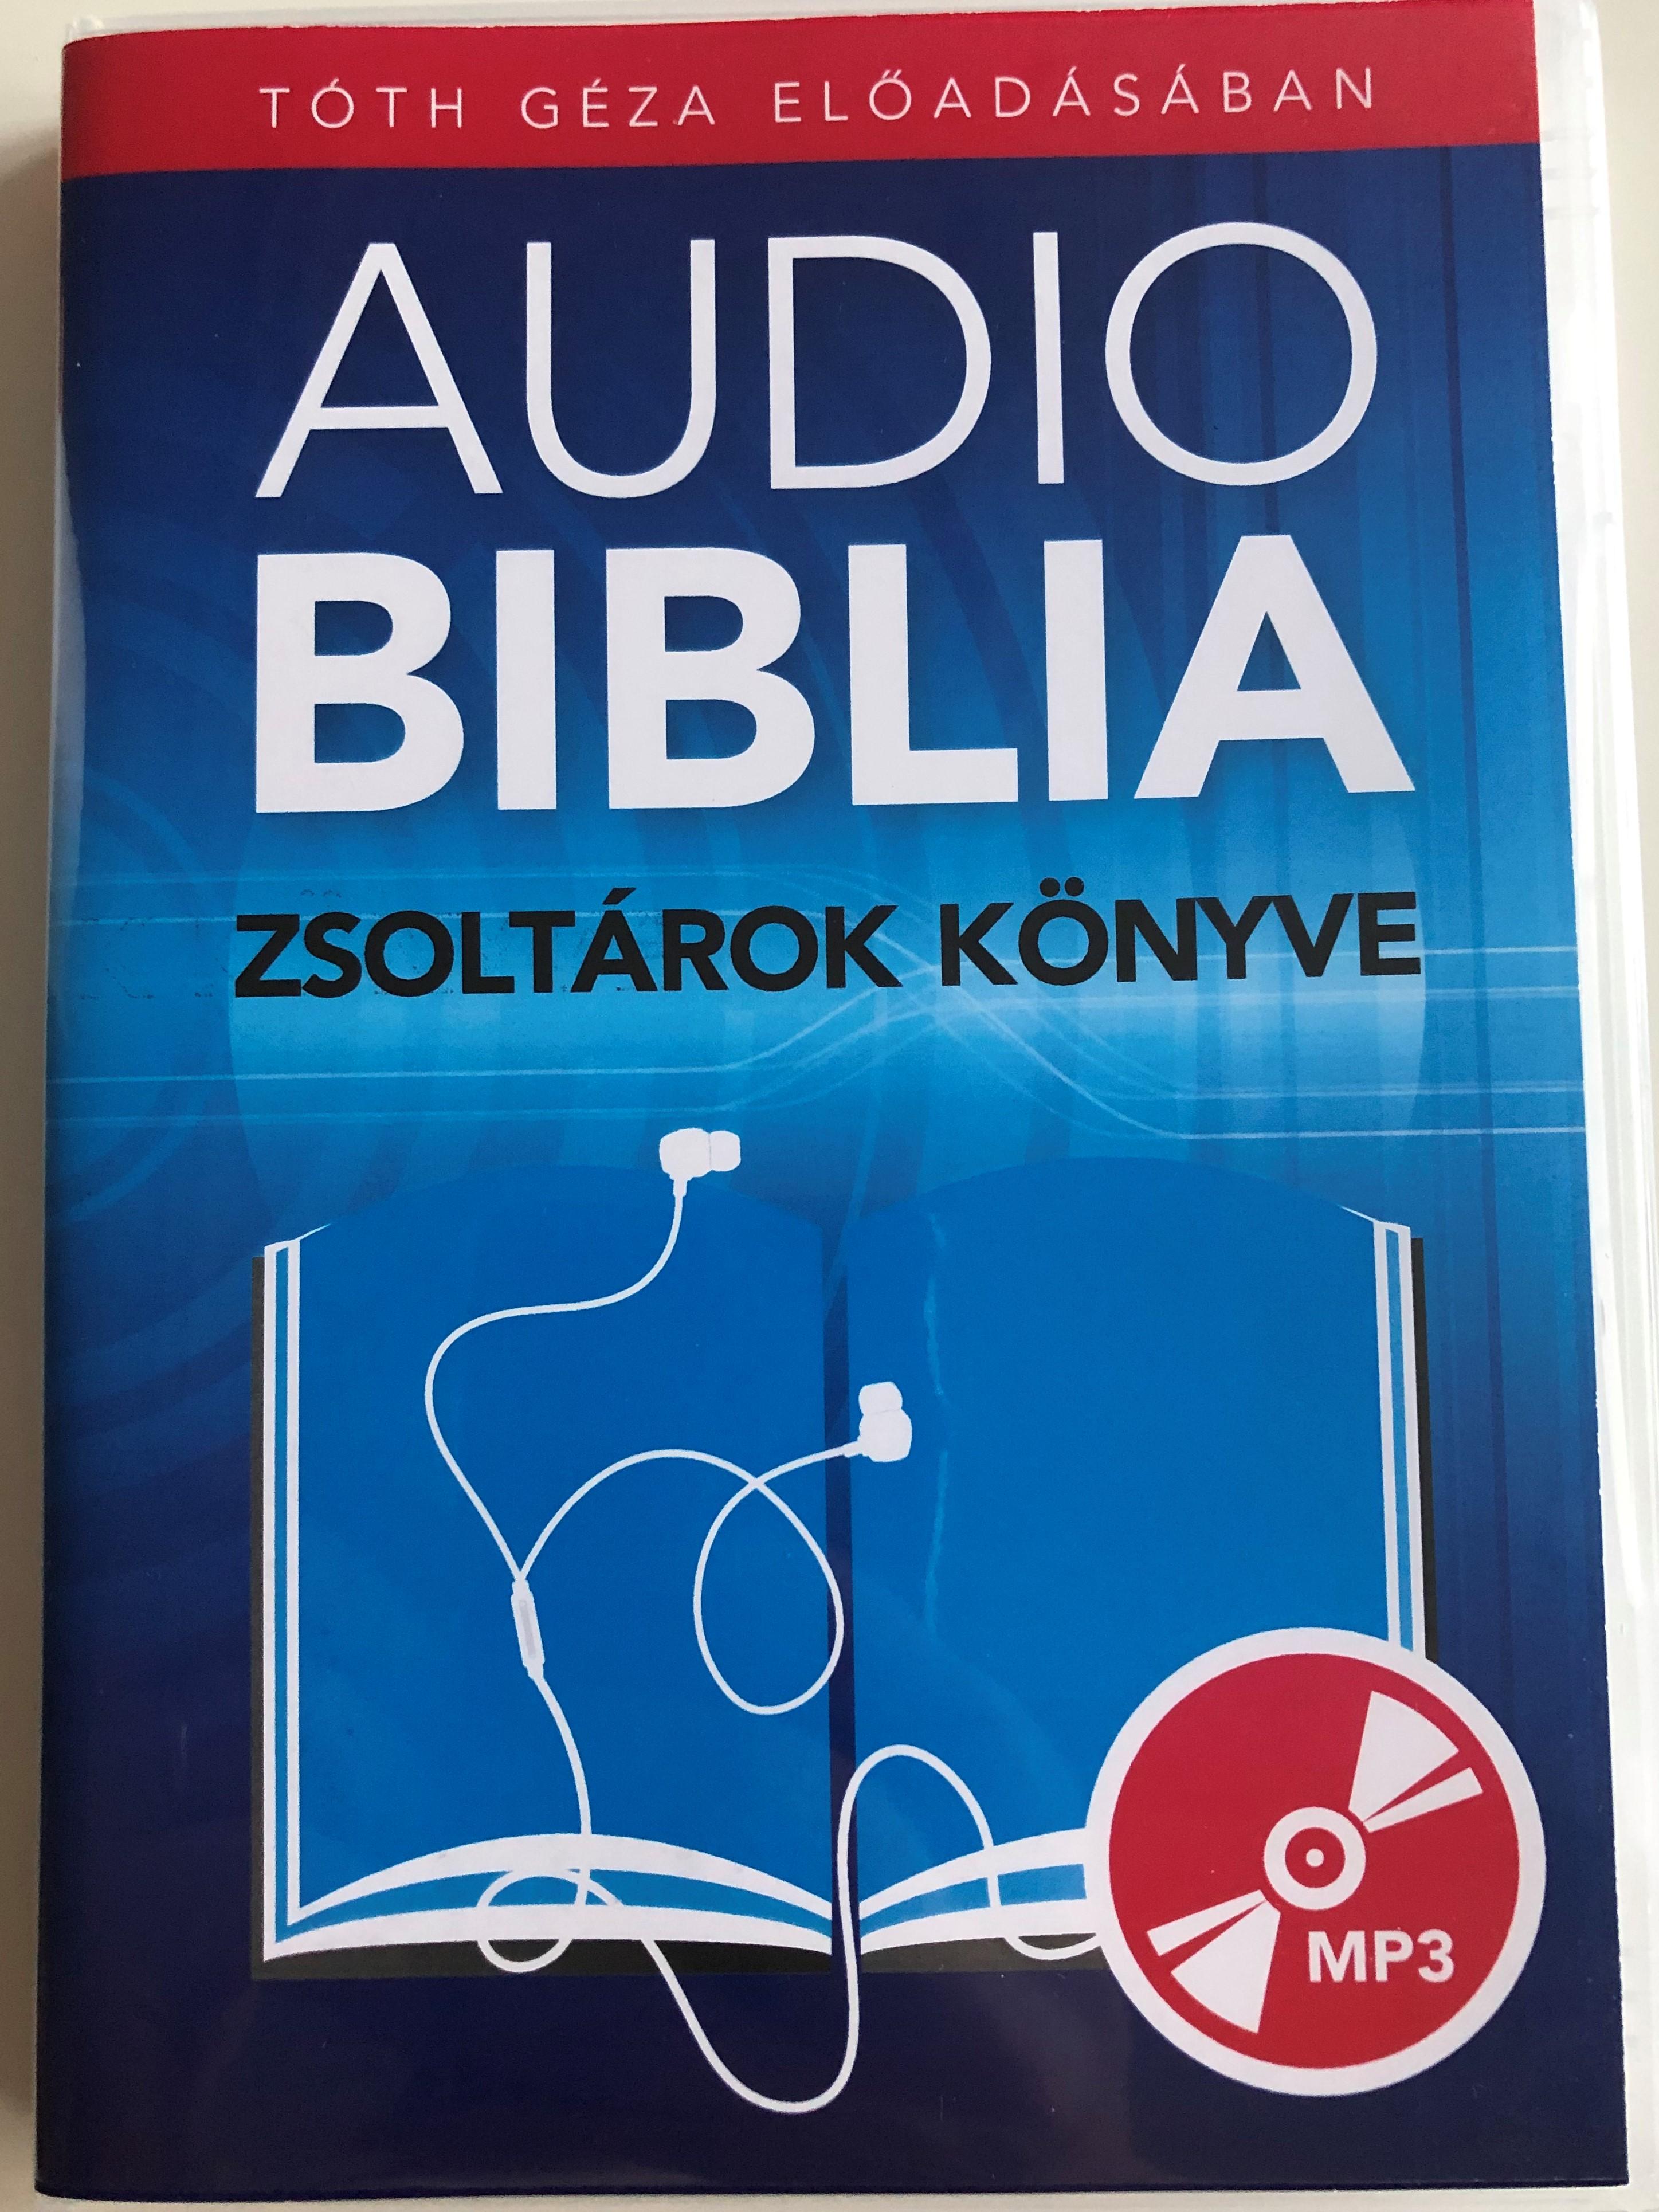 hungarian-audio-bible-the-book-of-psalms-audio-biblia-1.jpg